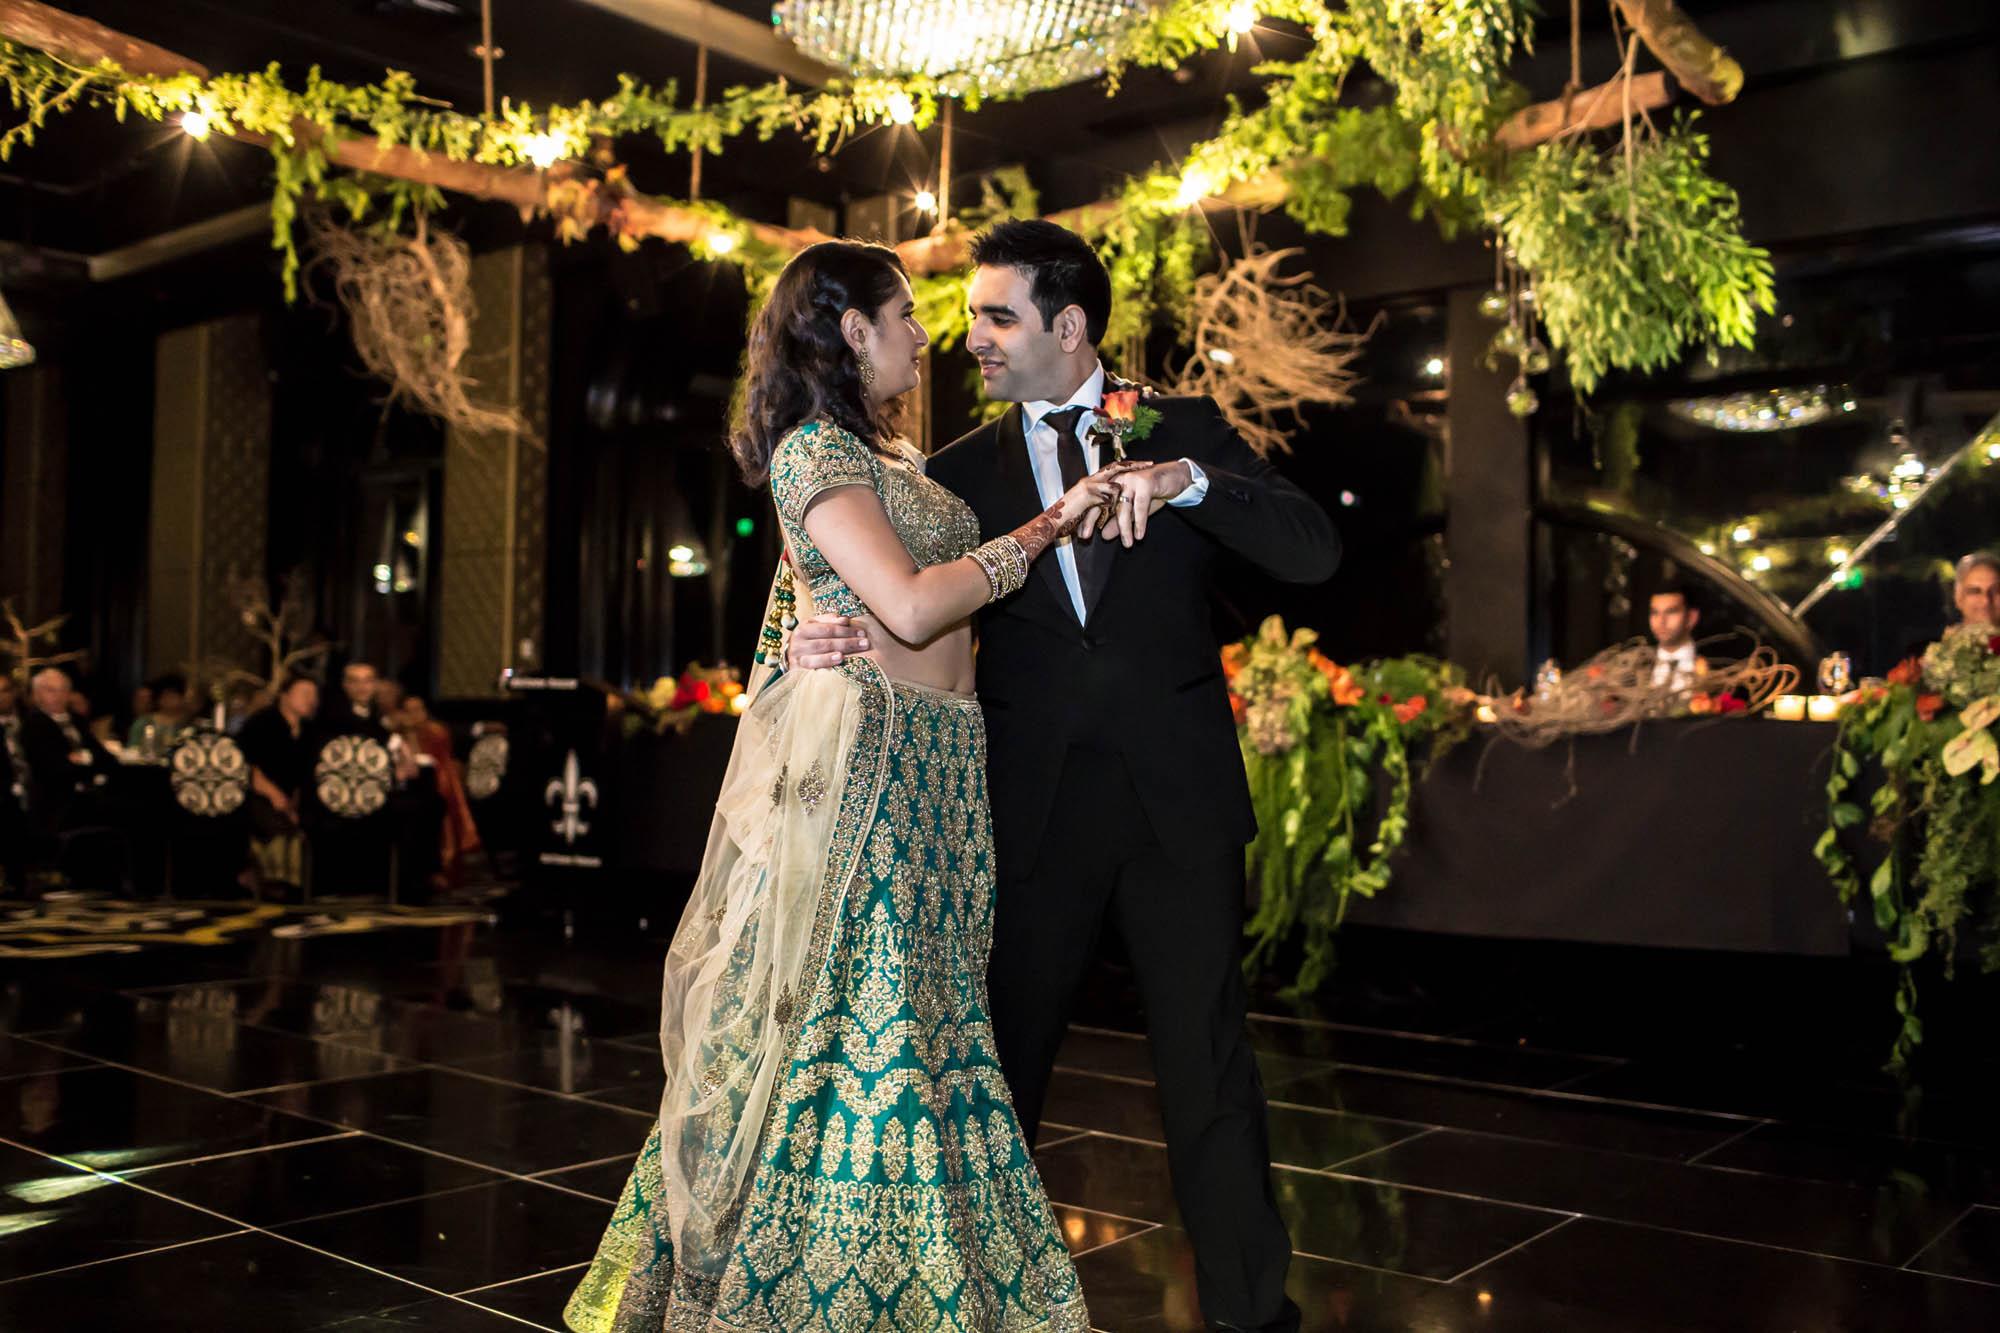 MacDougall-Photography-Sydney-Wedding-Photographers-59.jpg